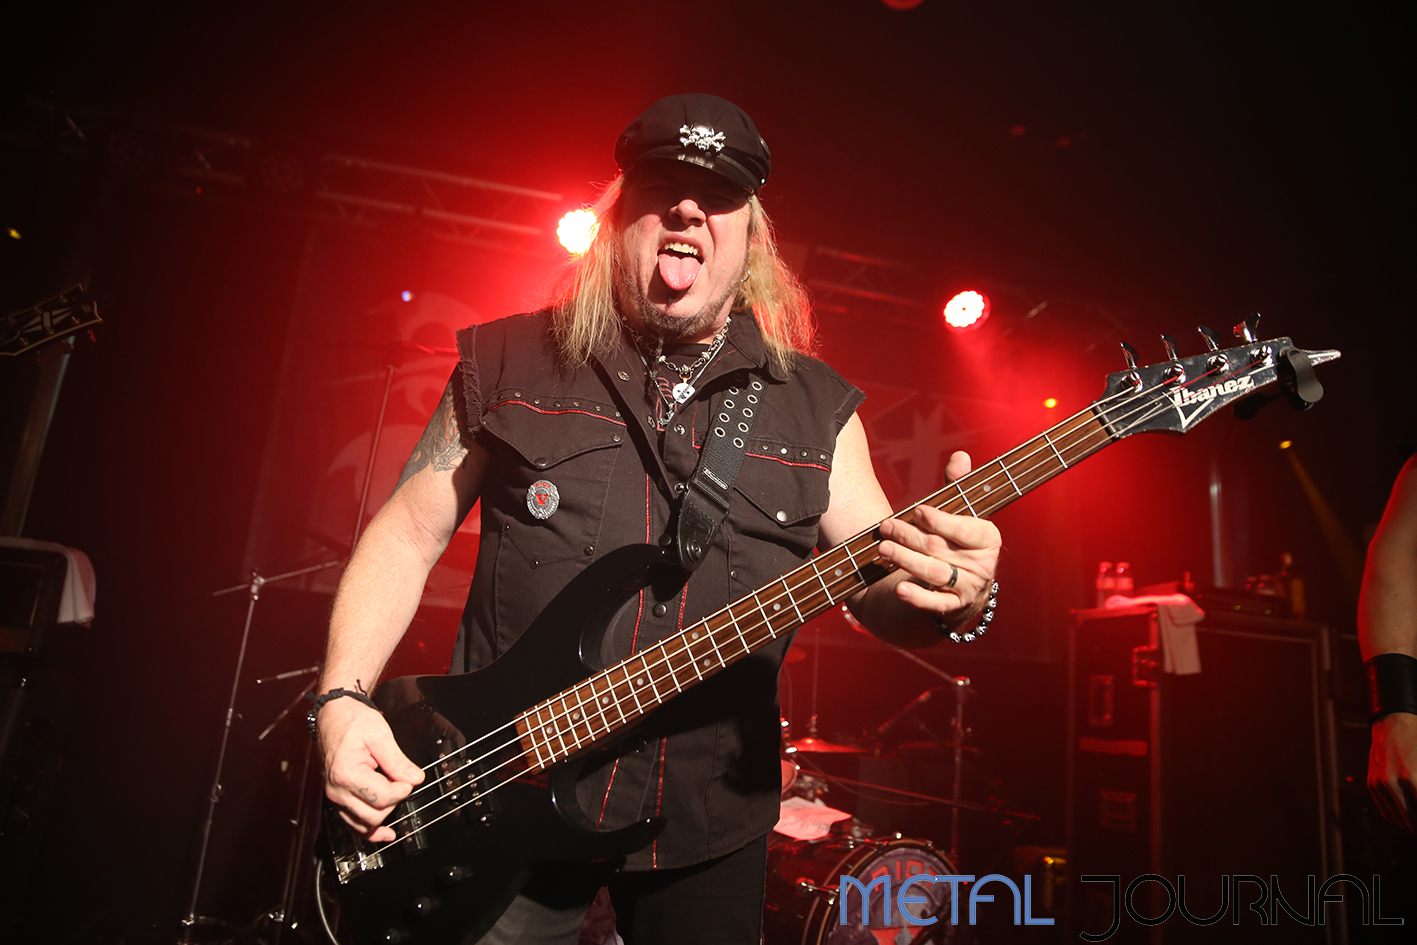 riot v - metal journal 2019 pic 14